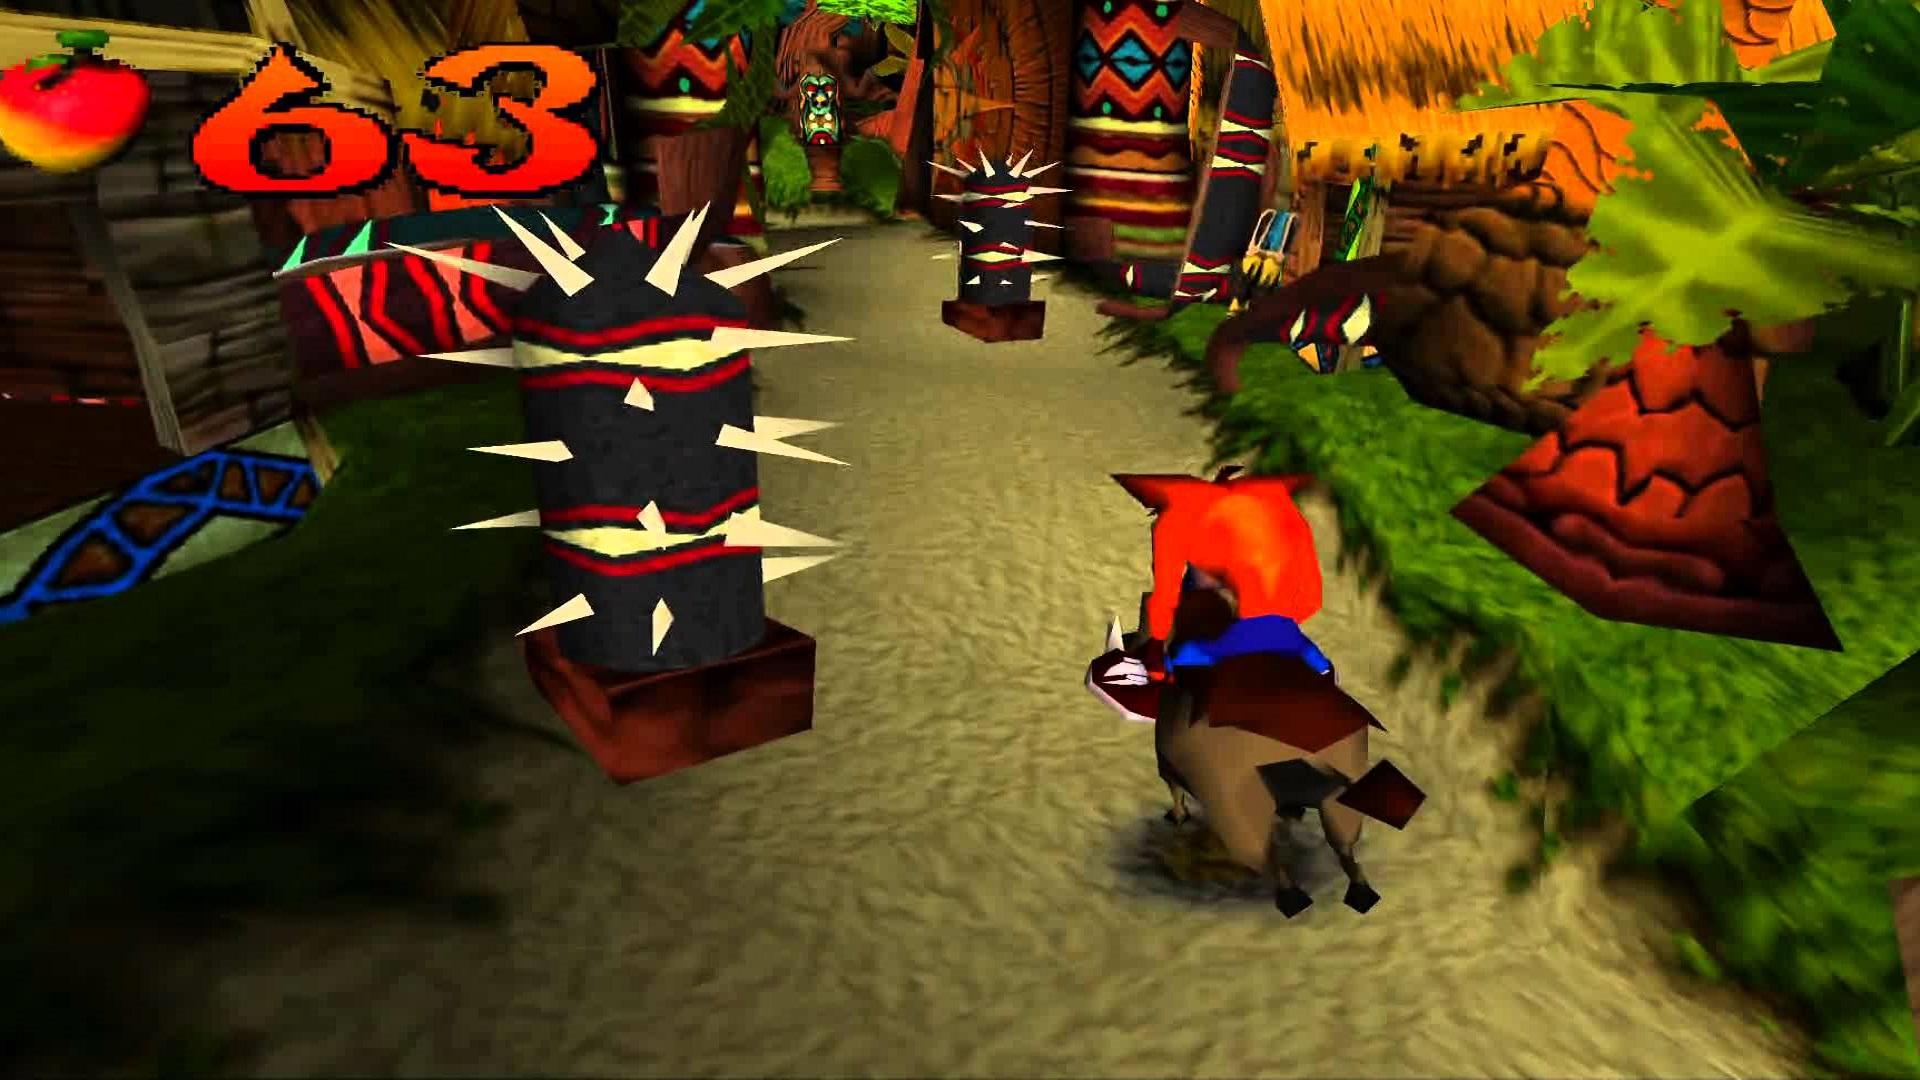 Crash Bandicoot, Sony Computer Entertainment